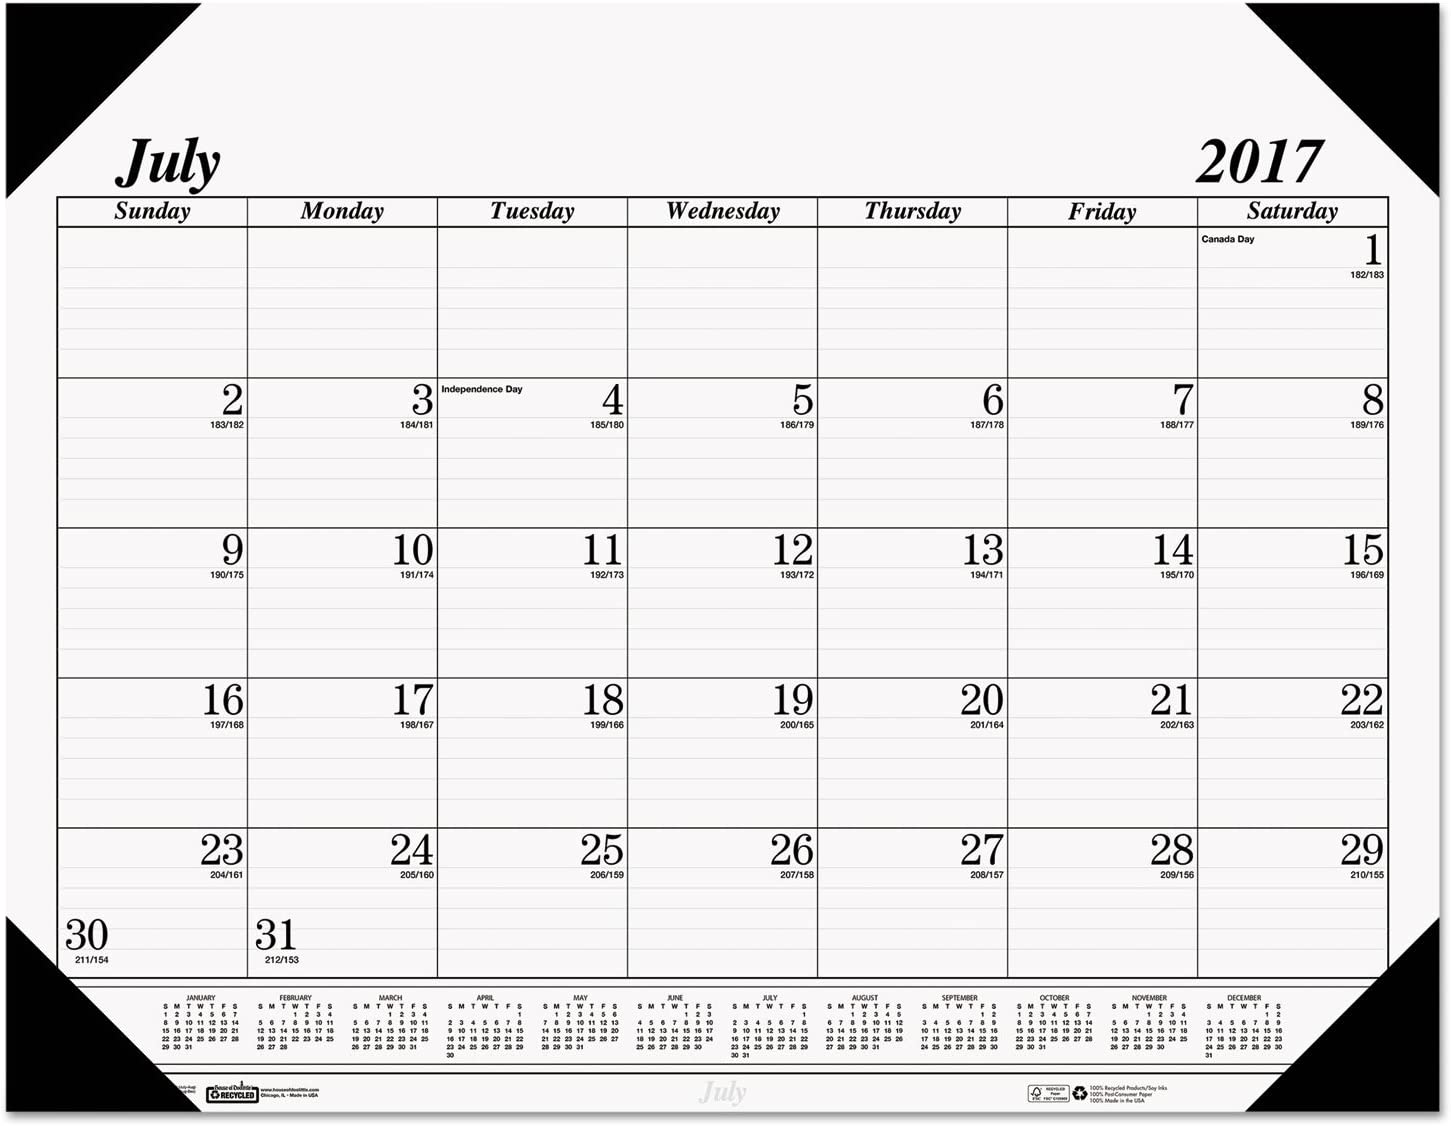 House of Doolittle 2017 Monthly Desk Pad Calendar 22 x 17 Economy HOD12402-17